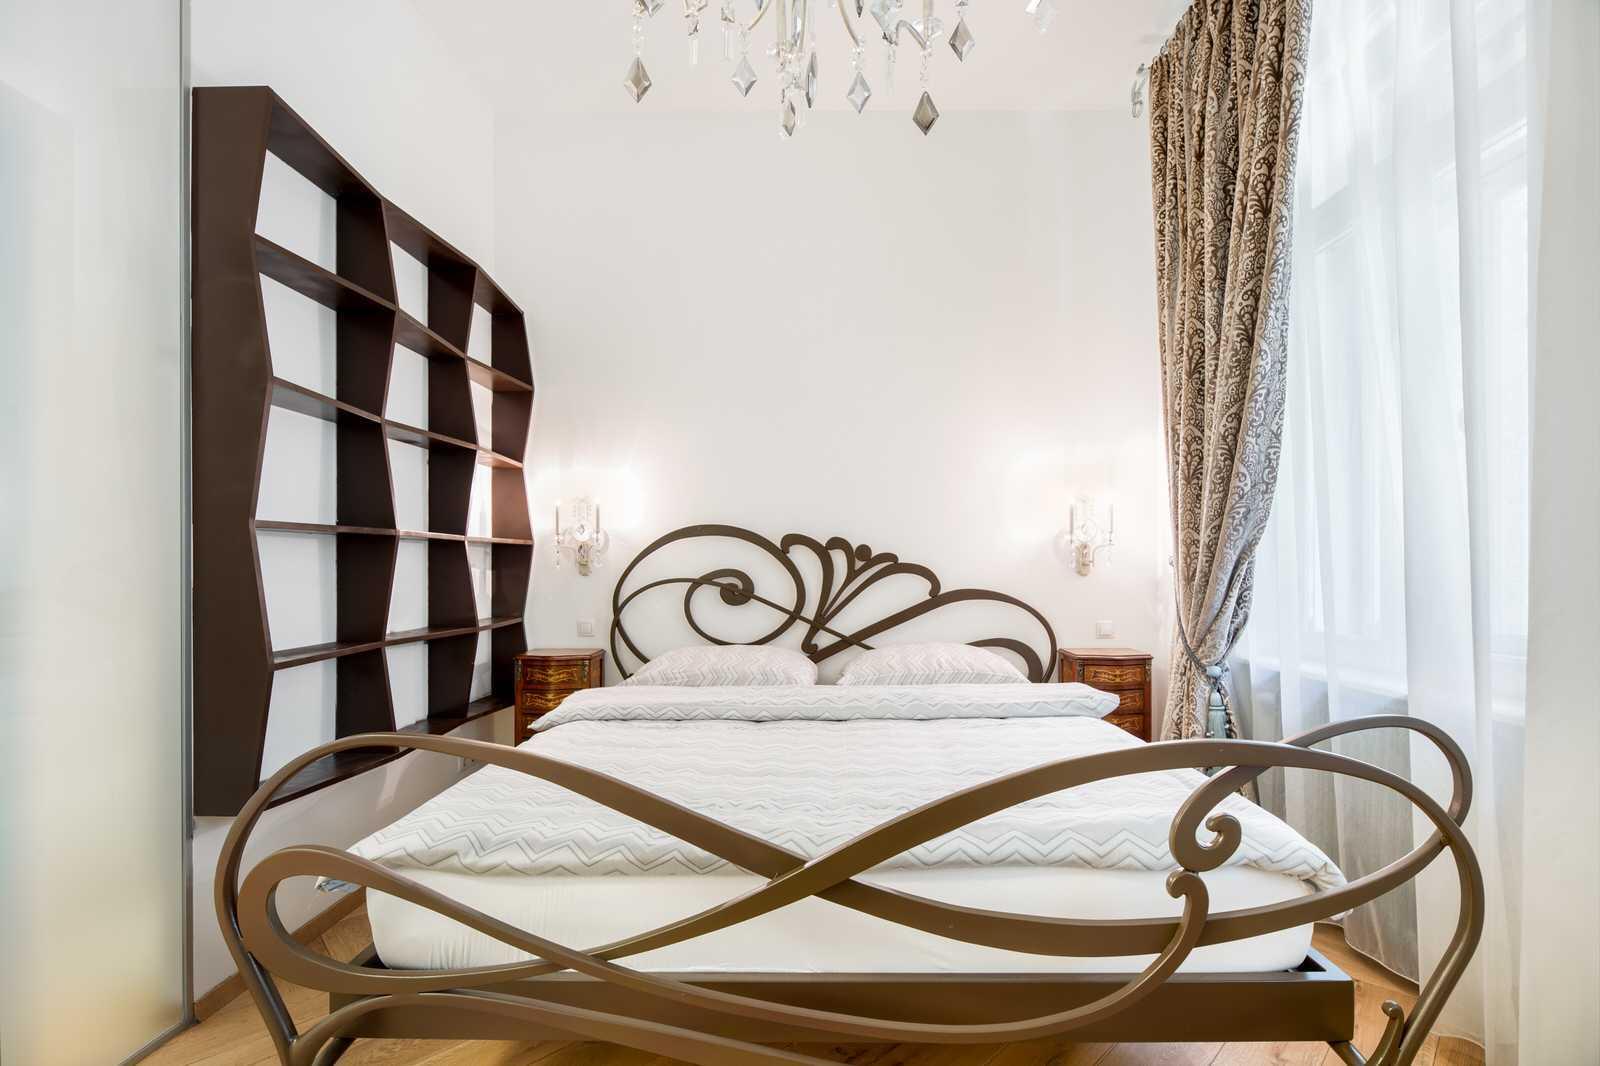 Ljubljana 2-bedroom Beethovnova apartment's master bedroom with a king size bed